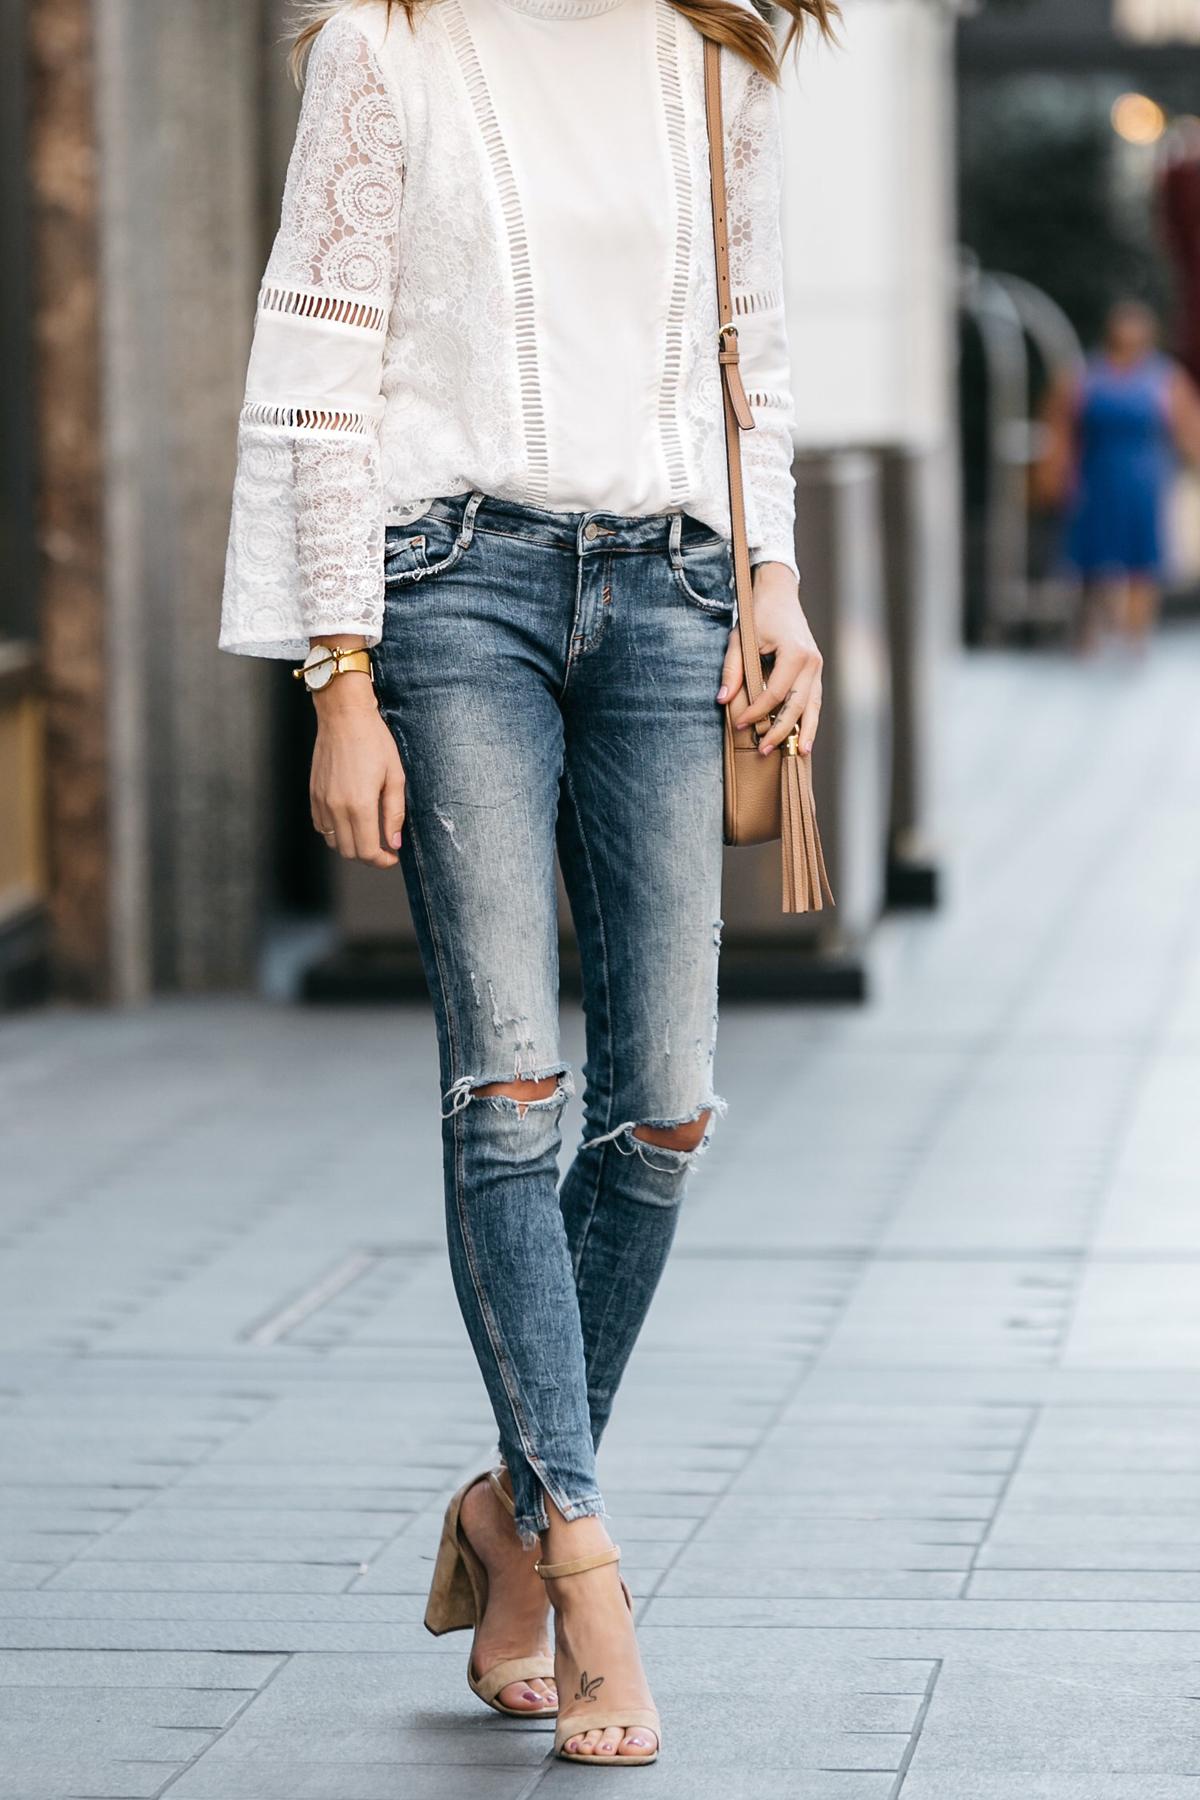 Fashion Jackson, Dallas Blogger, Fashion Blogger, Street Style, Mink Pink White Lace Top, Zara Denim Ripped Skinny Jeans, Gucci Soho Disco Handbag, Steve Madden Carrson Heeled Sandals